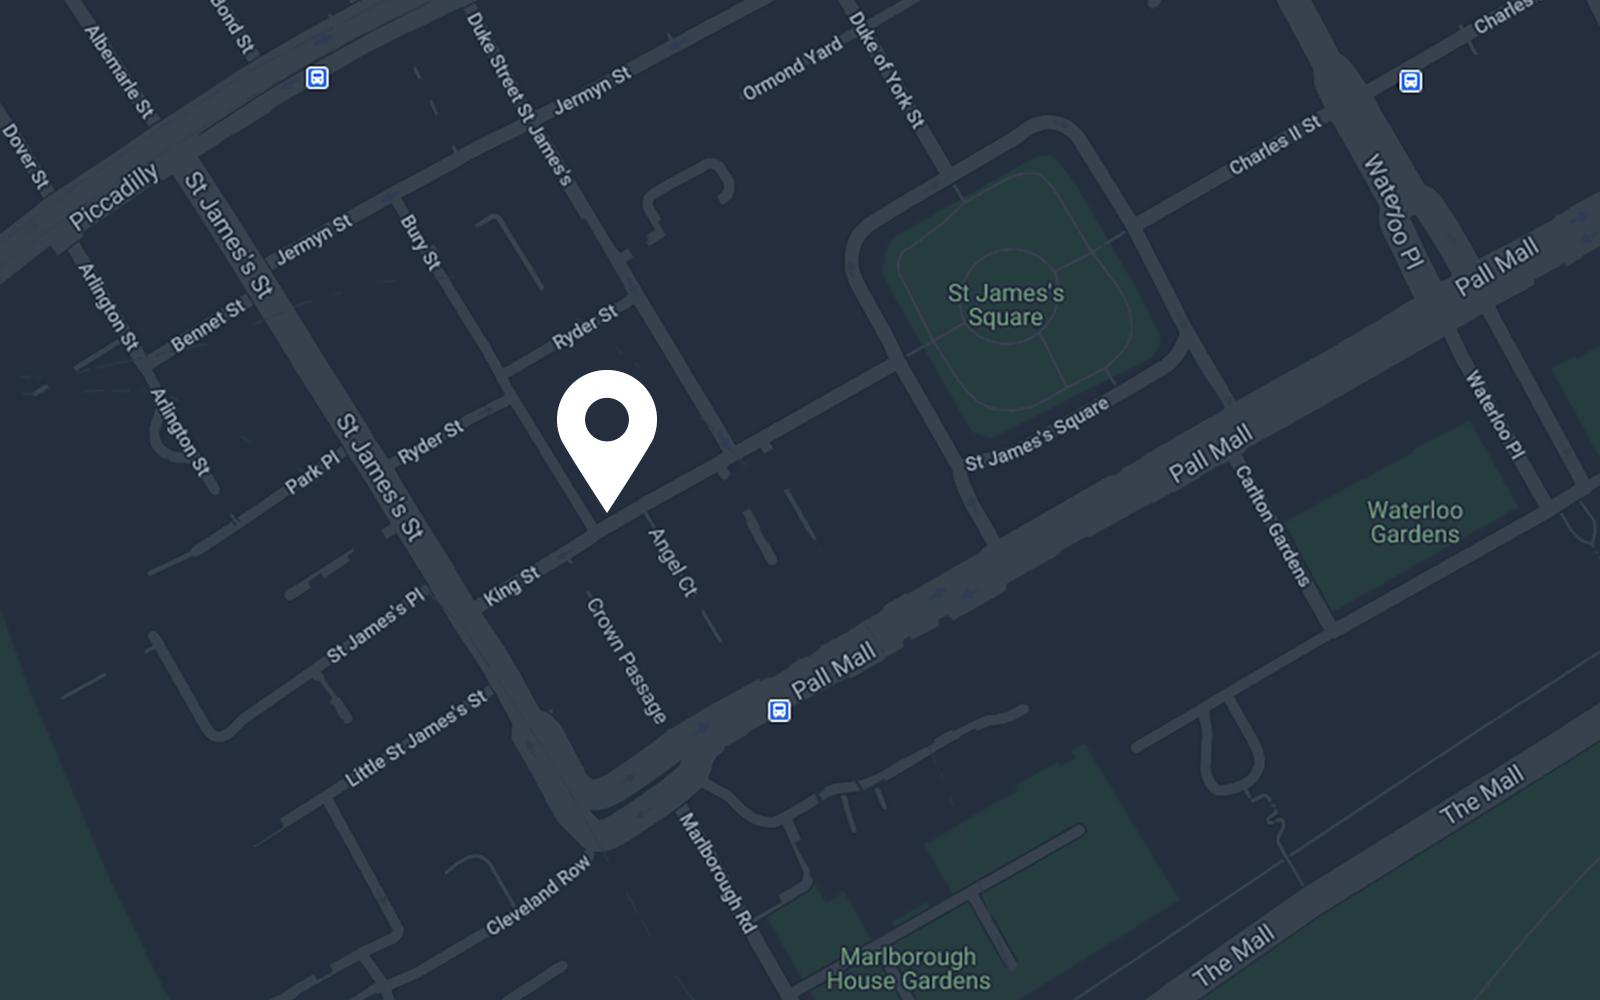 8 King Street St. James 's